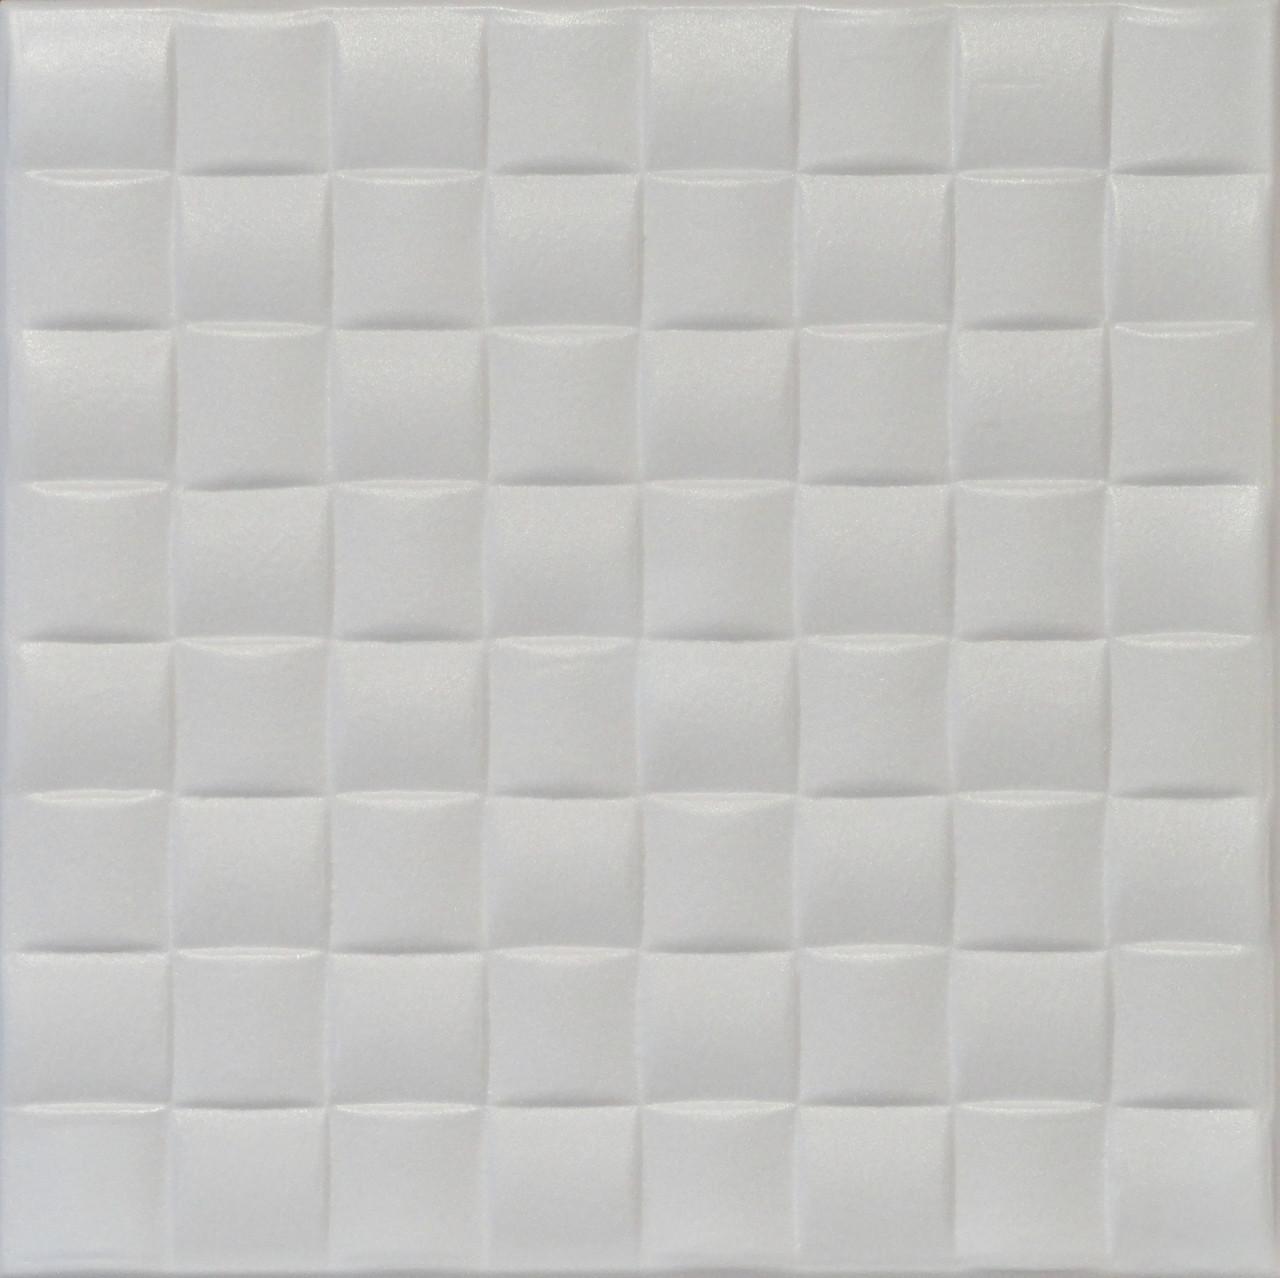 styrofoam as glue